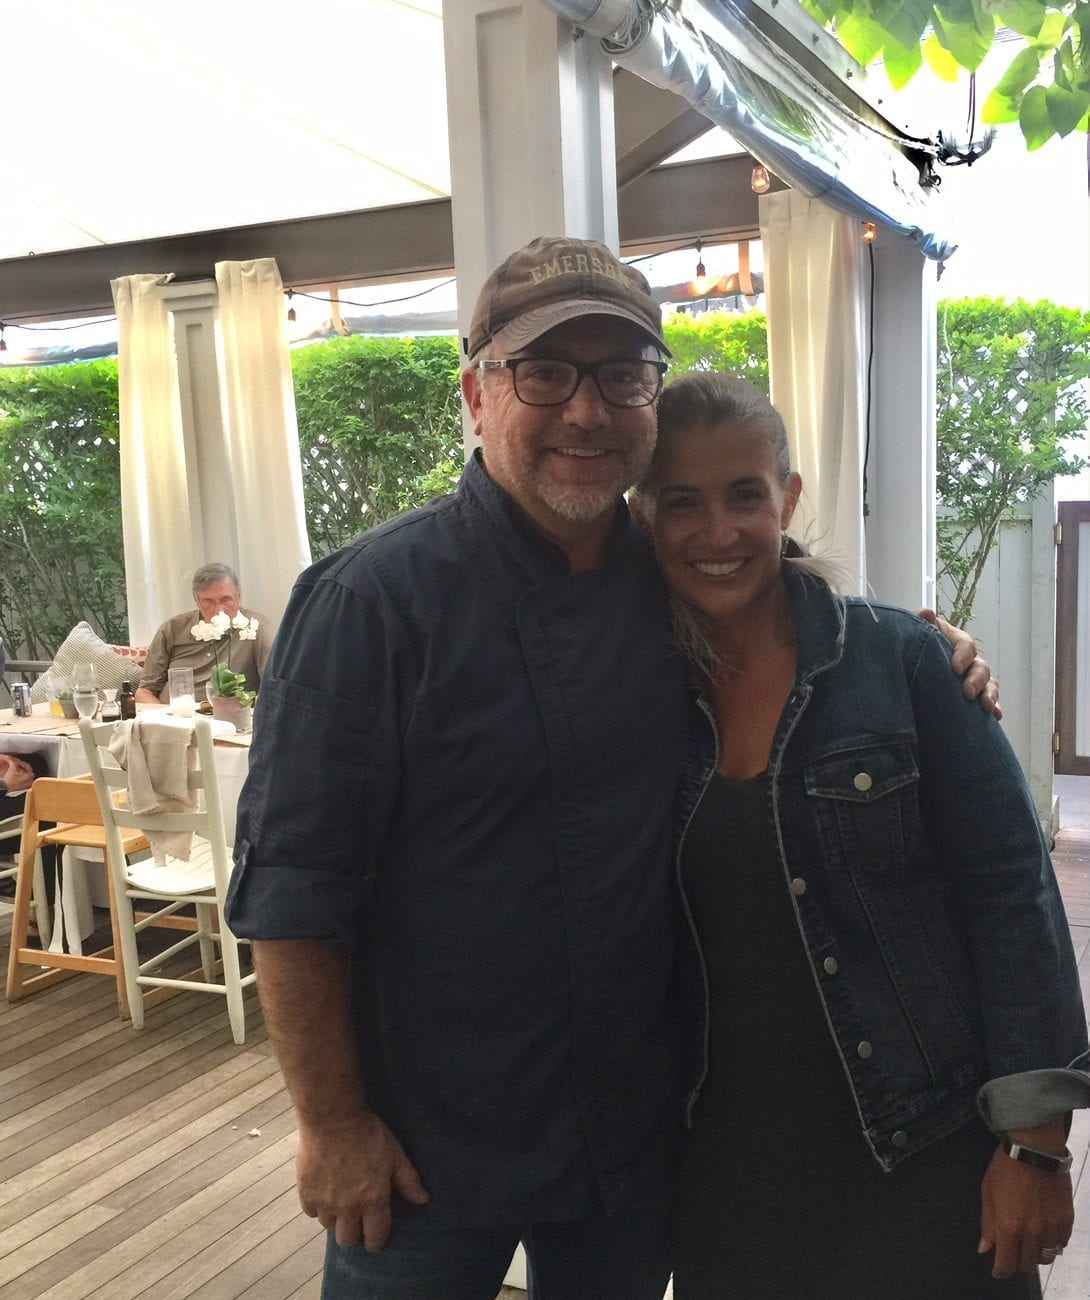 Chef Christian Thornton Atria Restaurant Hamming It Up With On Point Blog Martha's Vineyard Restaurants